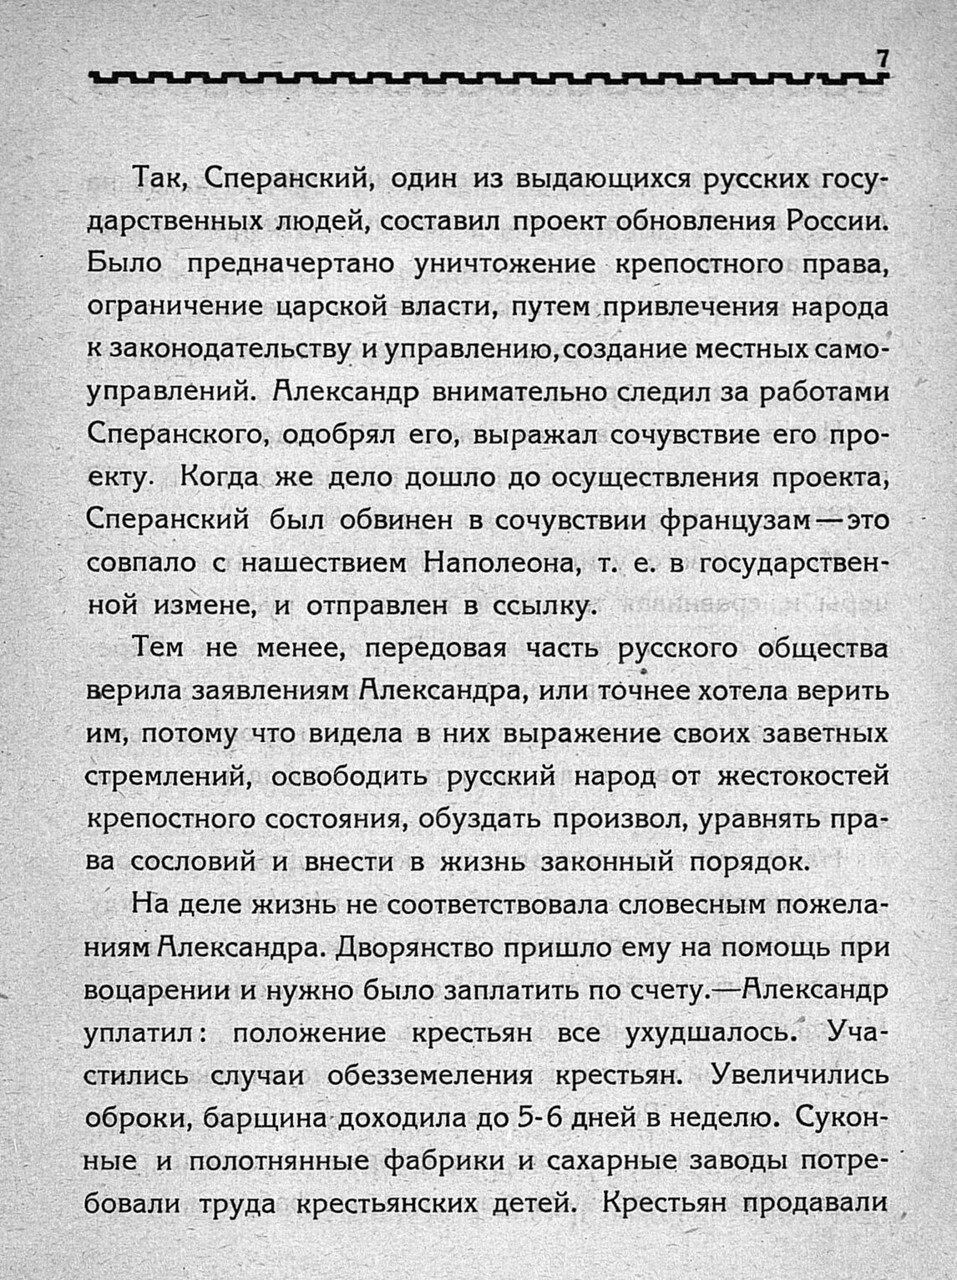 https://img-fotki.yandex.ru/get/51236/199368979.23/0_1bfacb_fd8af071_XXXL.jpg